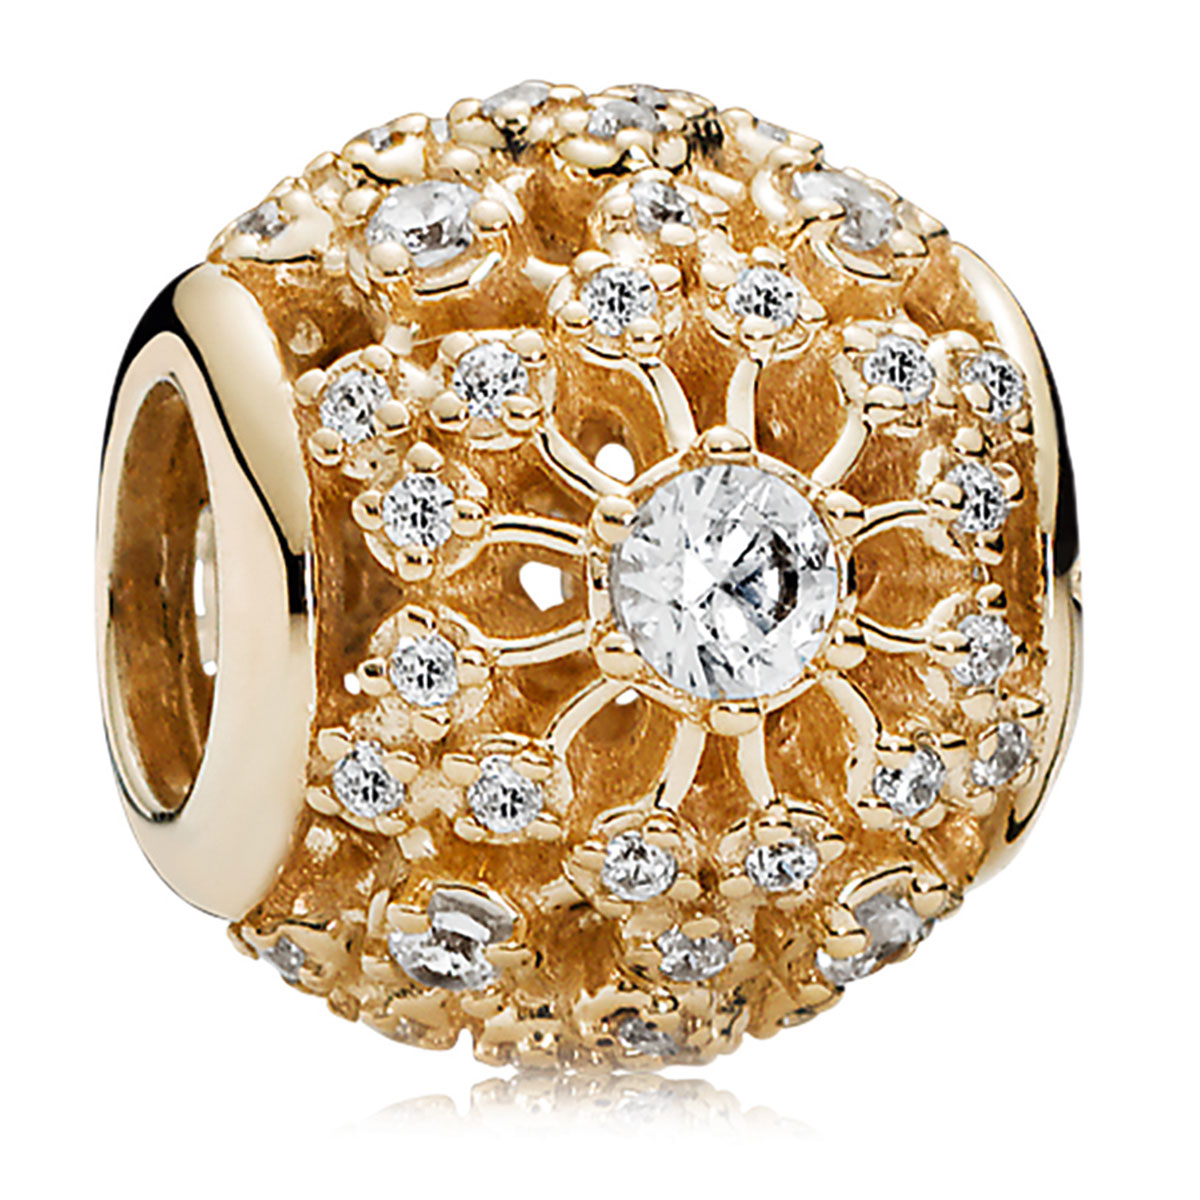 c522b683f PANDORA 14KT Gold Charms - Pancharmbracelets.com